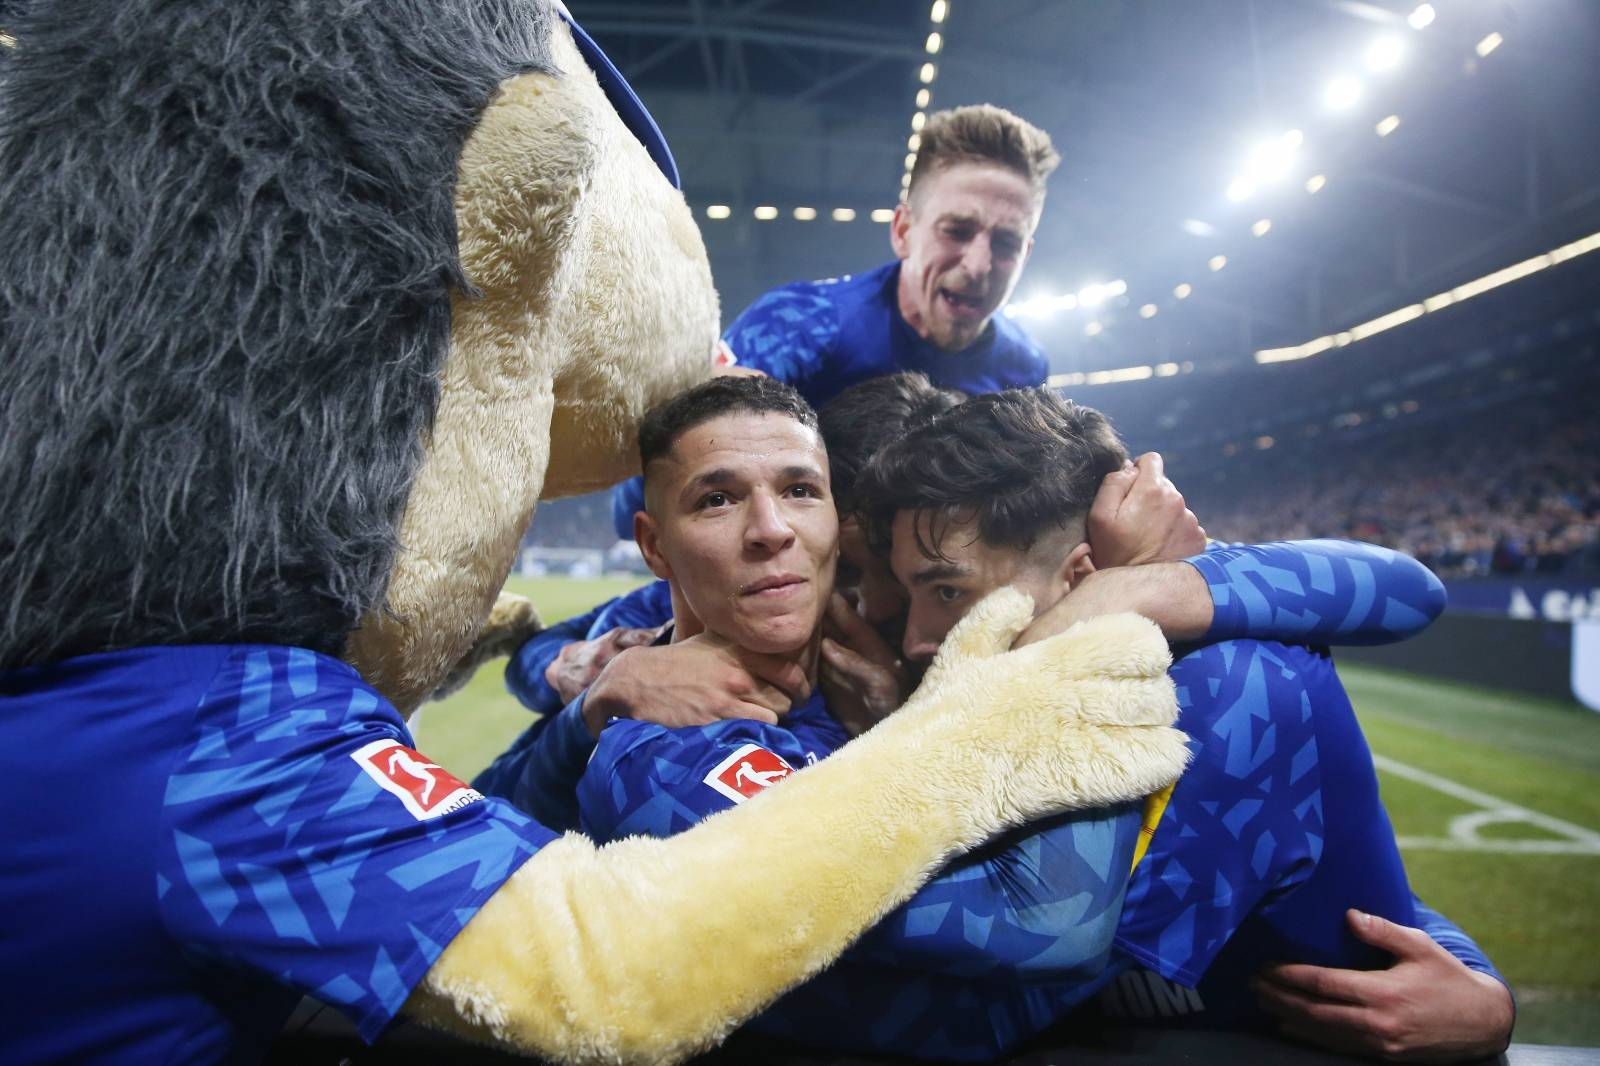 firo: 29.11.2019, Football, 2019/2020 1.Bundesliga FC Schalke 04 - Union Berlin